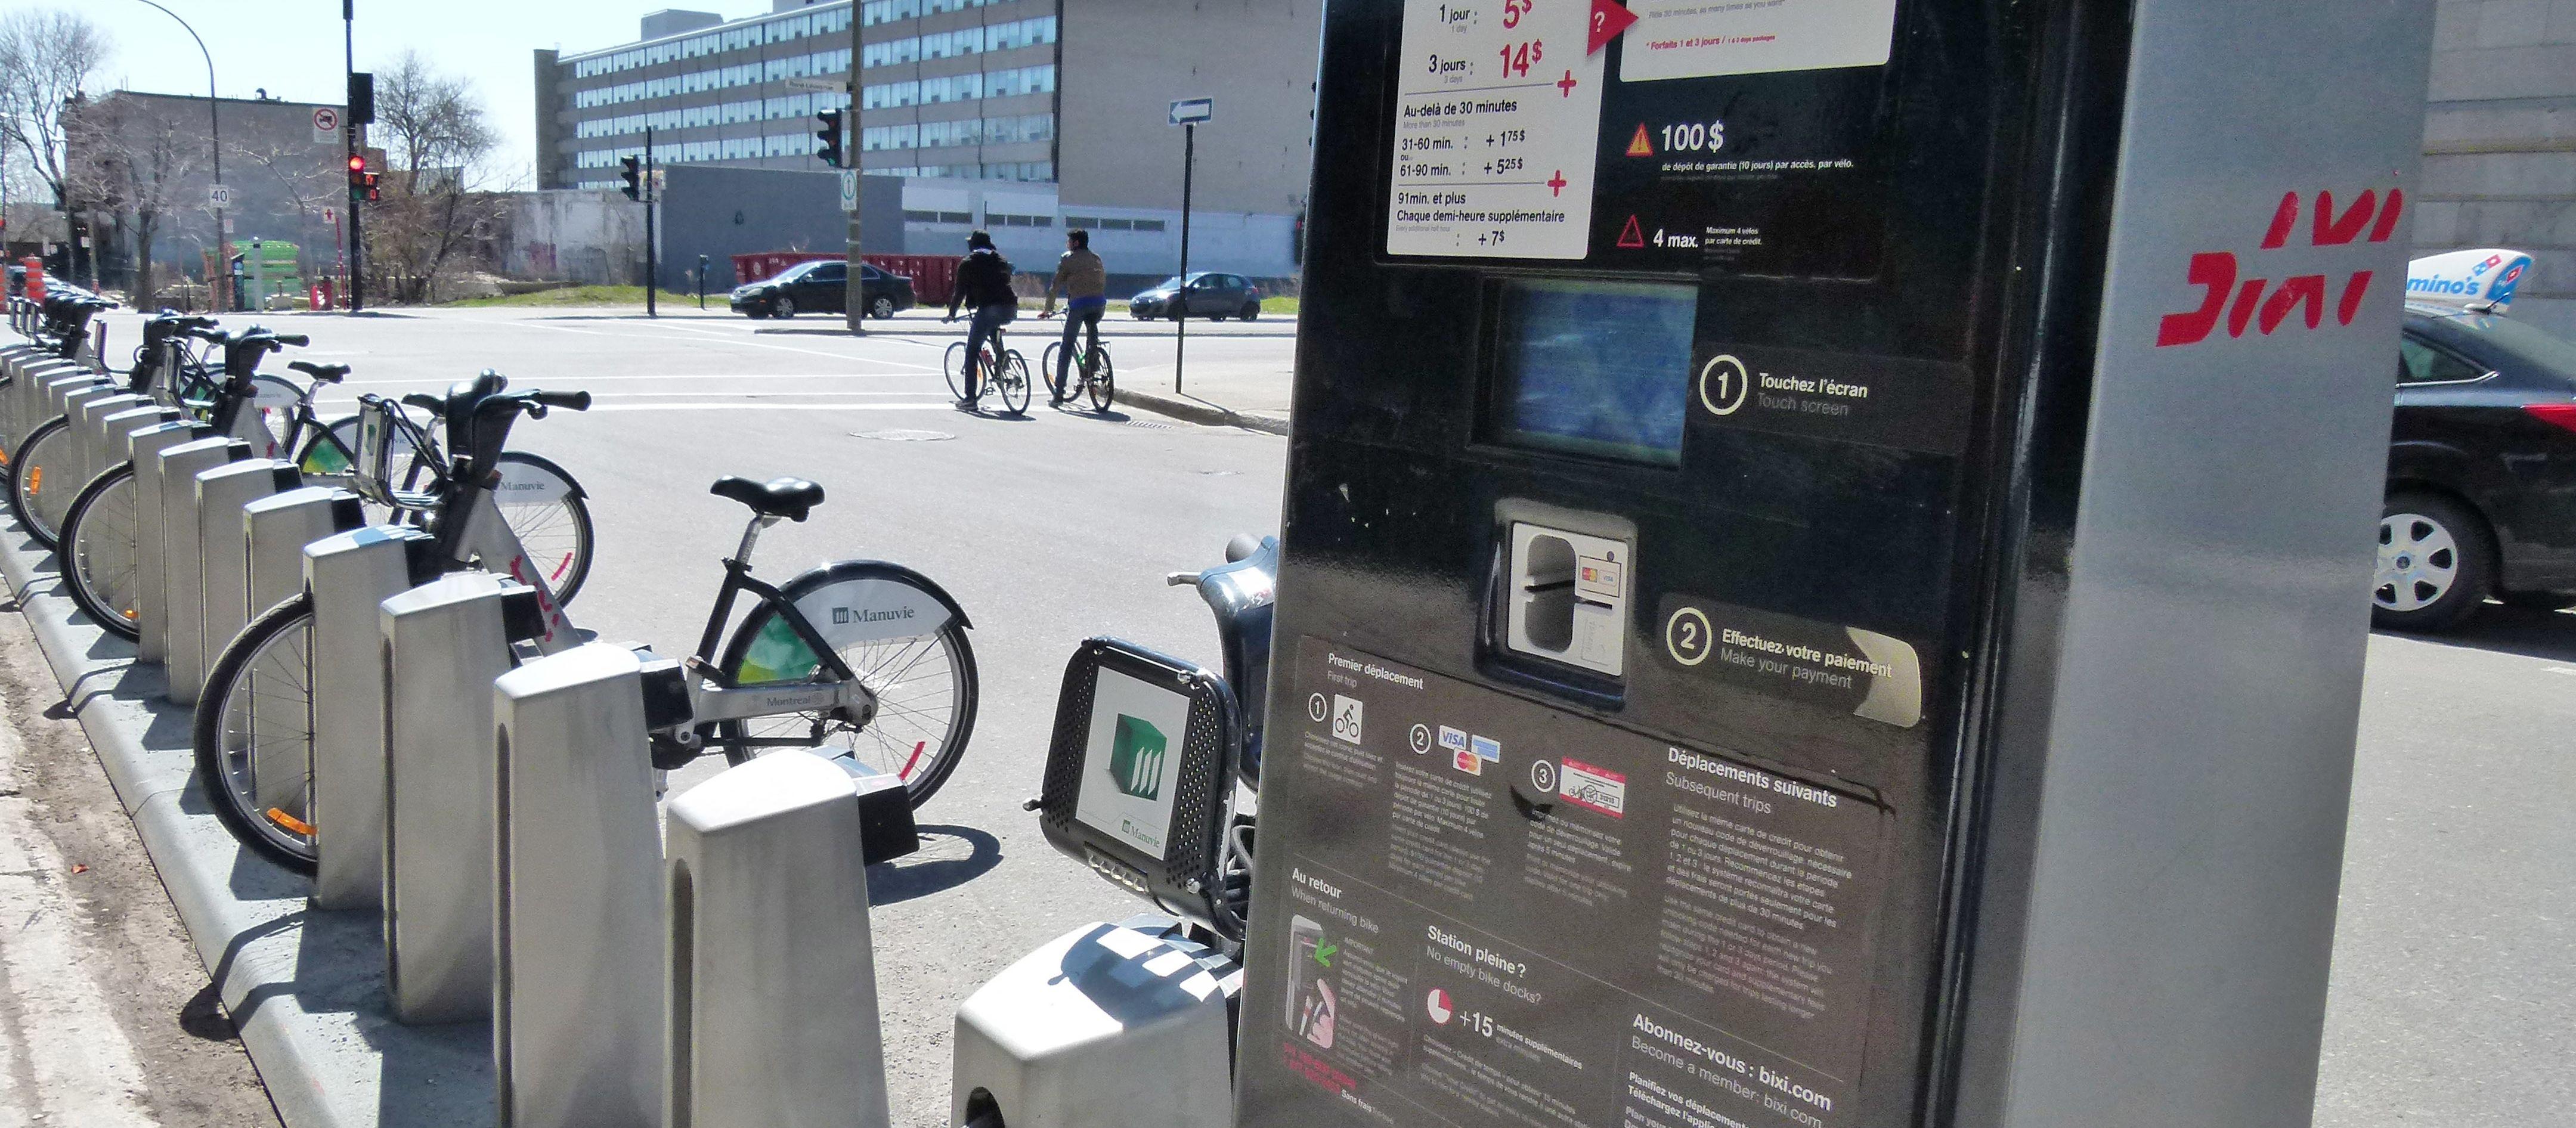 Bixi-Station in Montréal